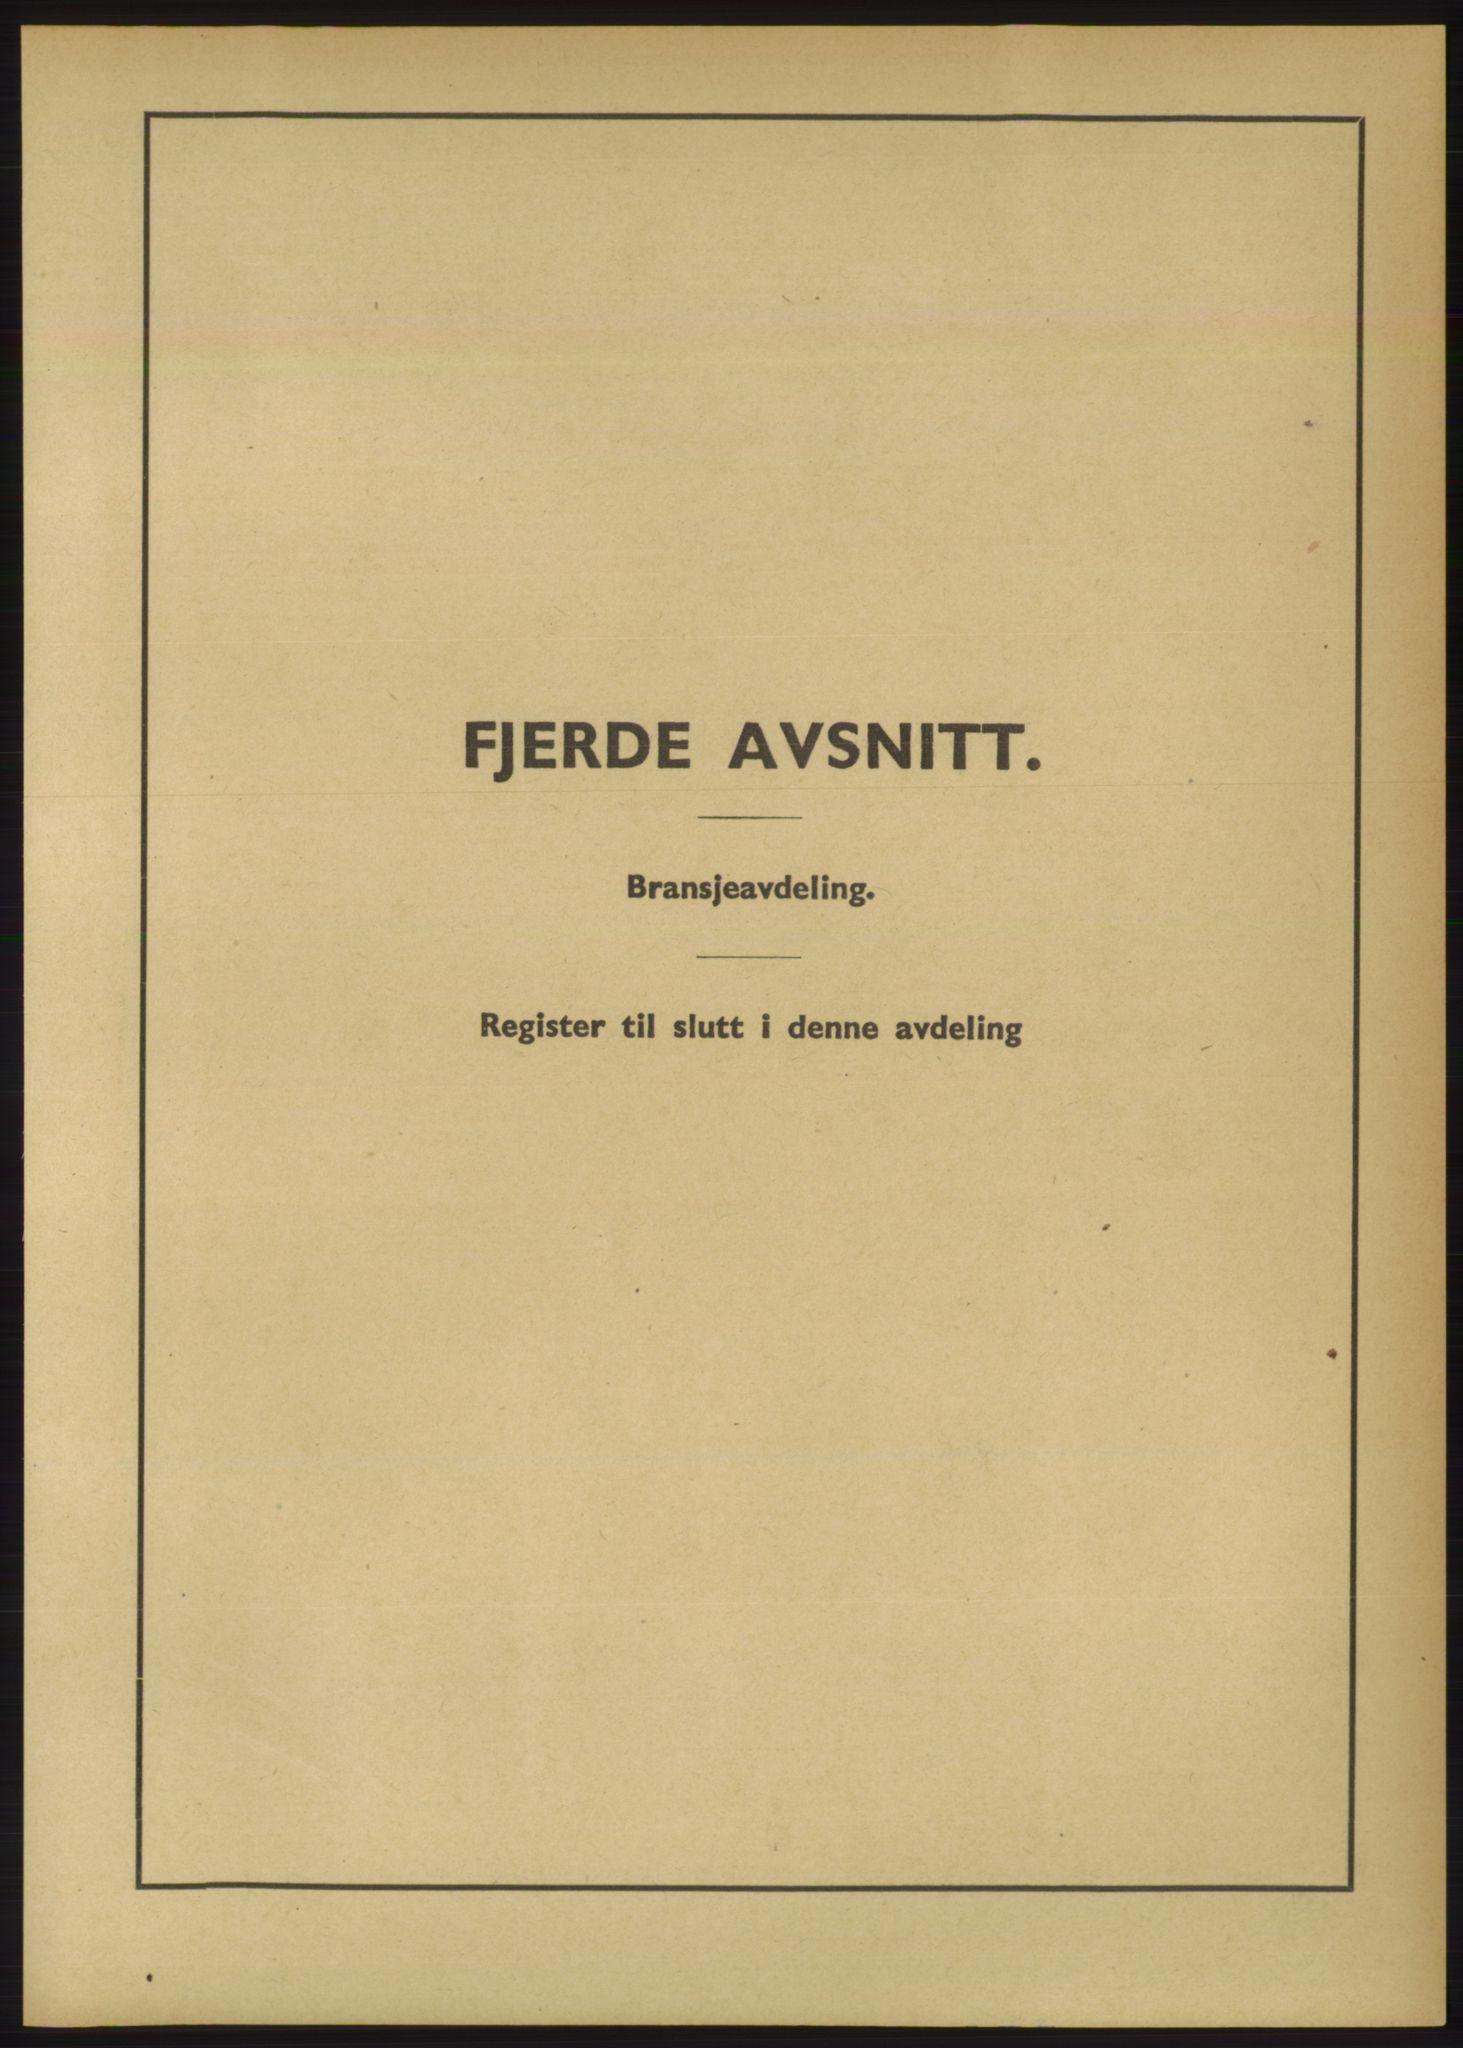 RA, Oslo adressebok (publikasjon)*, 1950, s. 2403